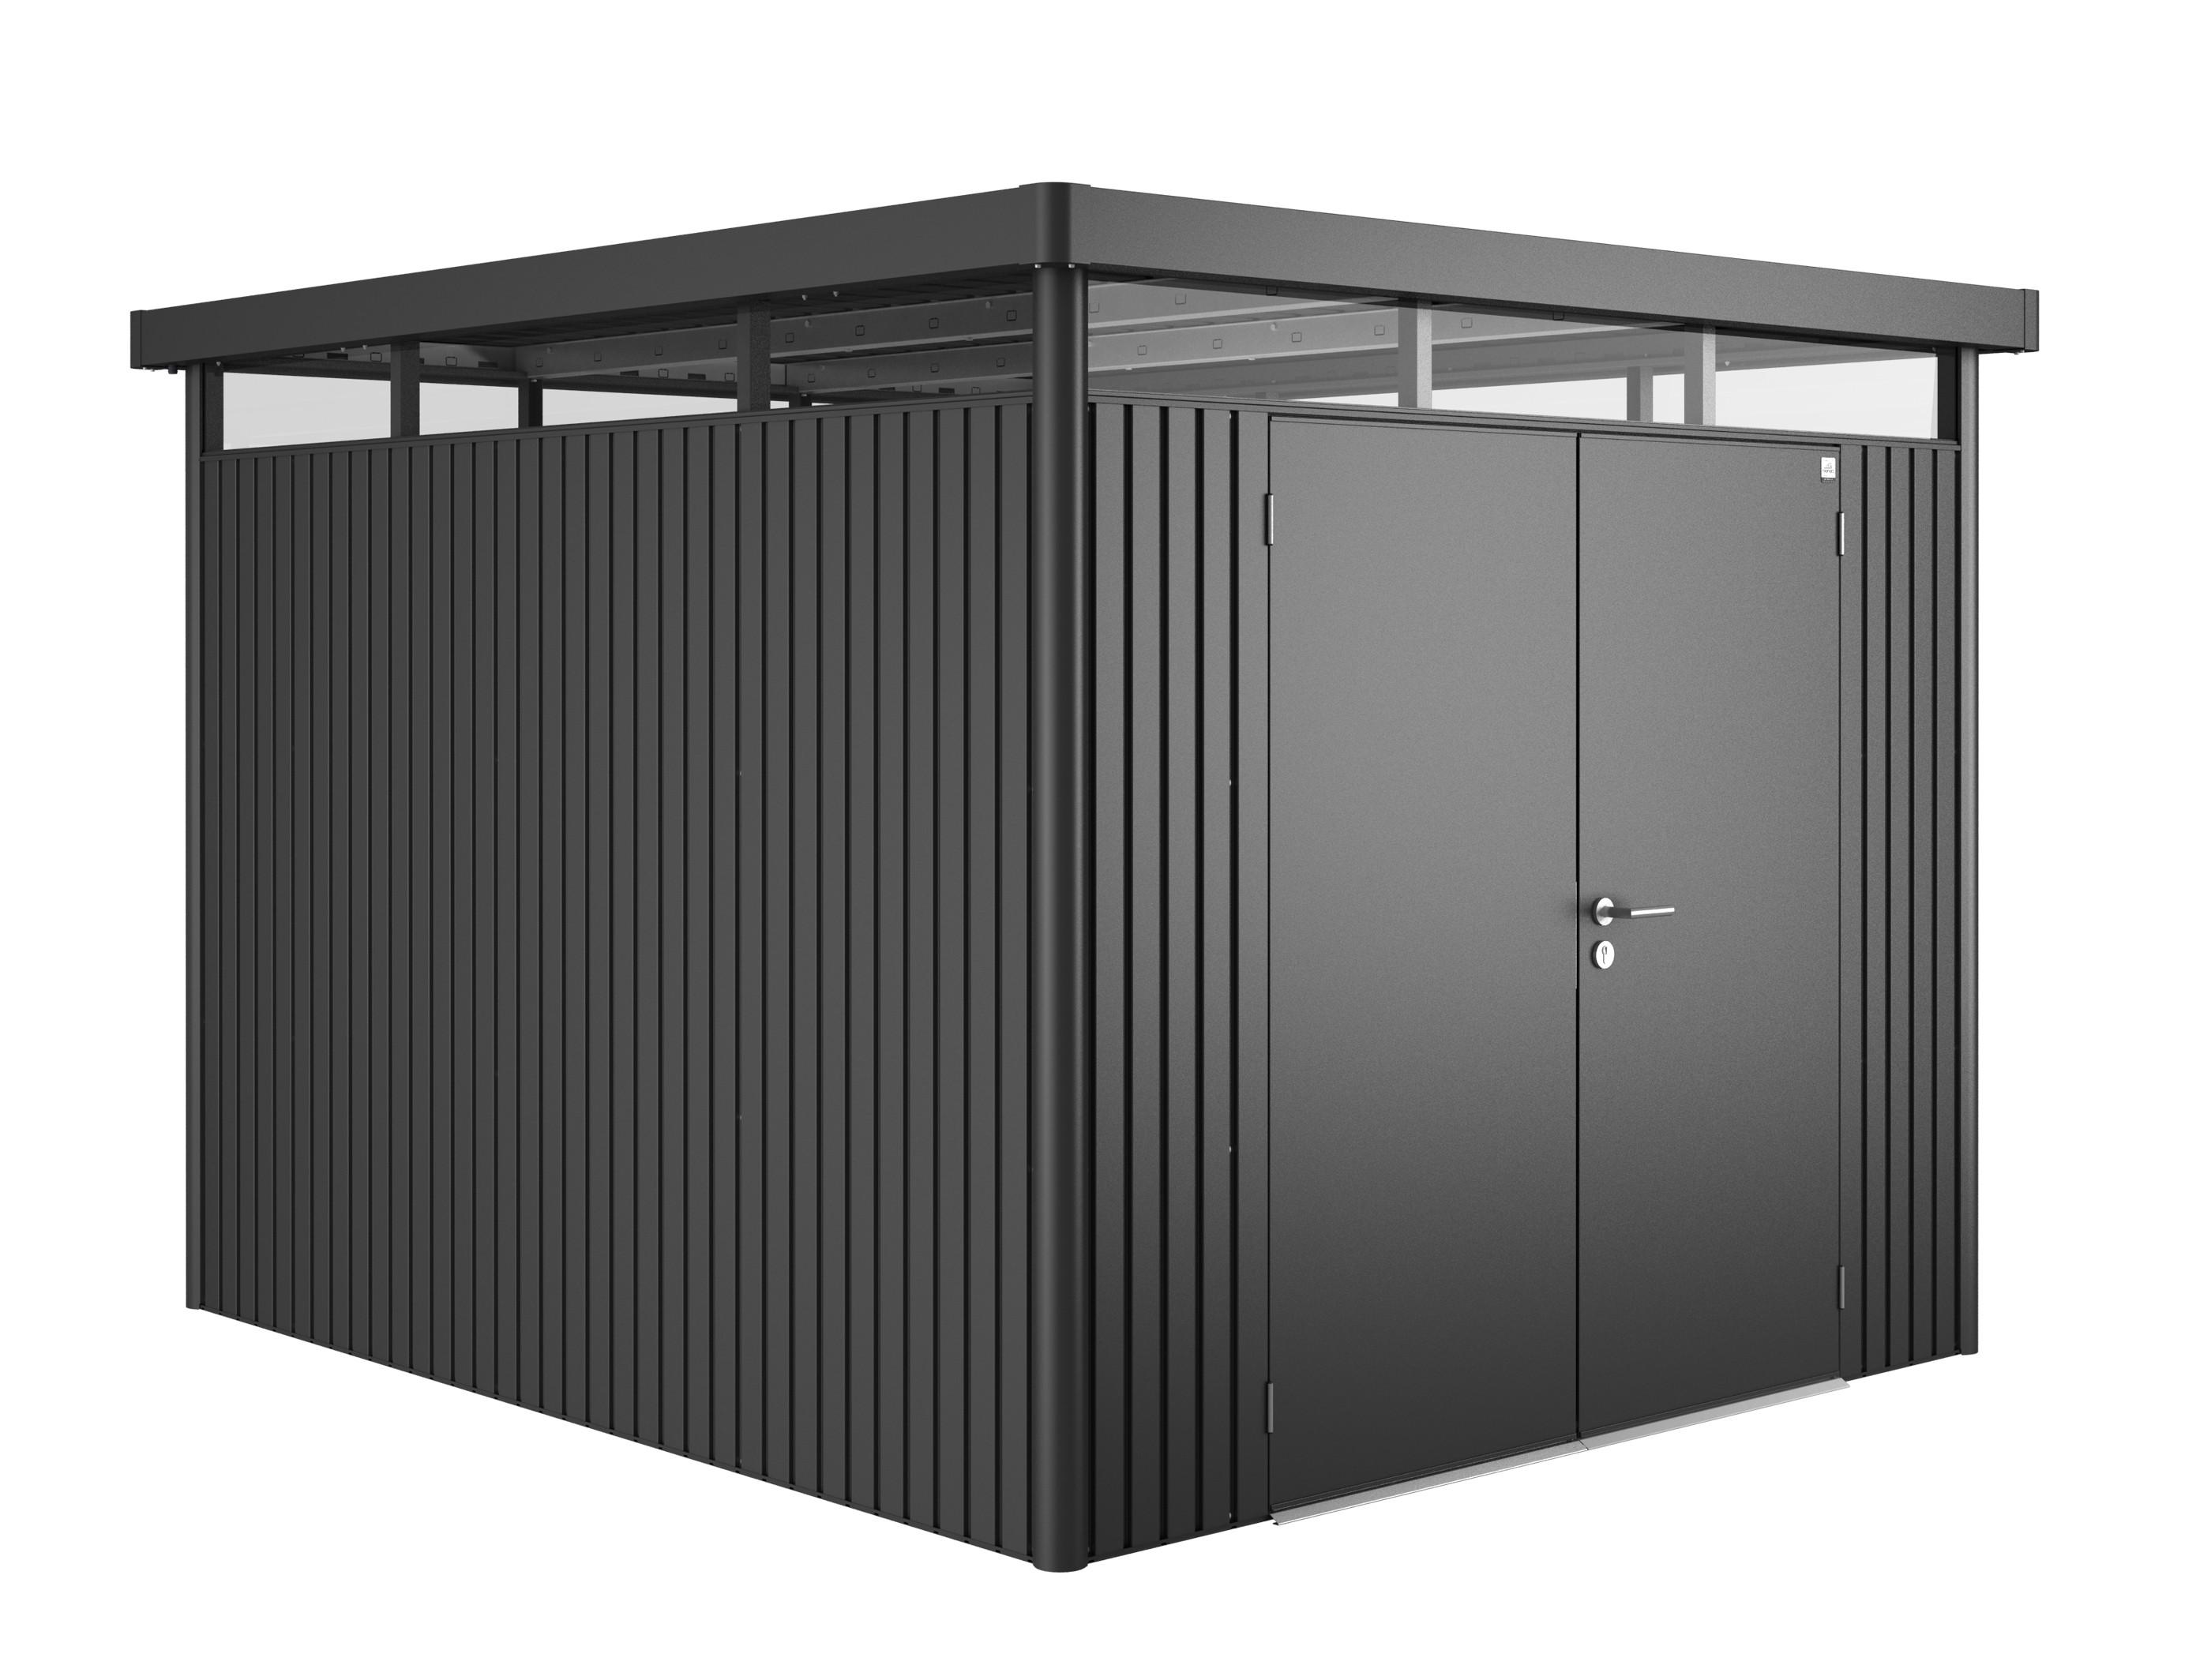 ger tehaus biohort highline h5 dunkelgrau metallic dt 275x315x222 bei. Black Bedroom Furniture Sets. Home Design Ideas